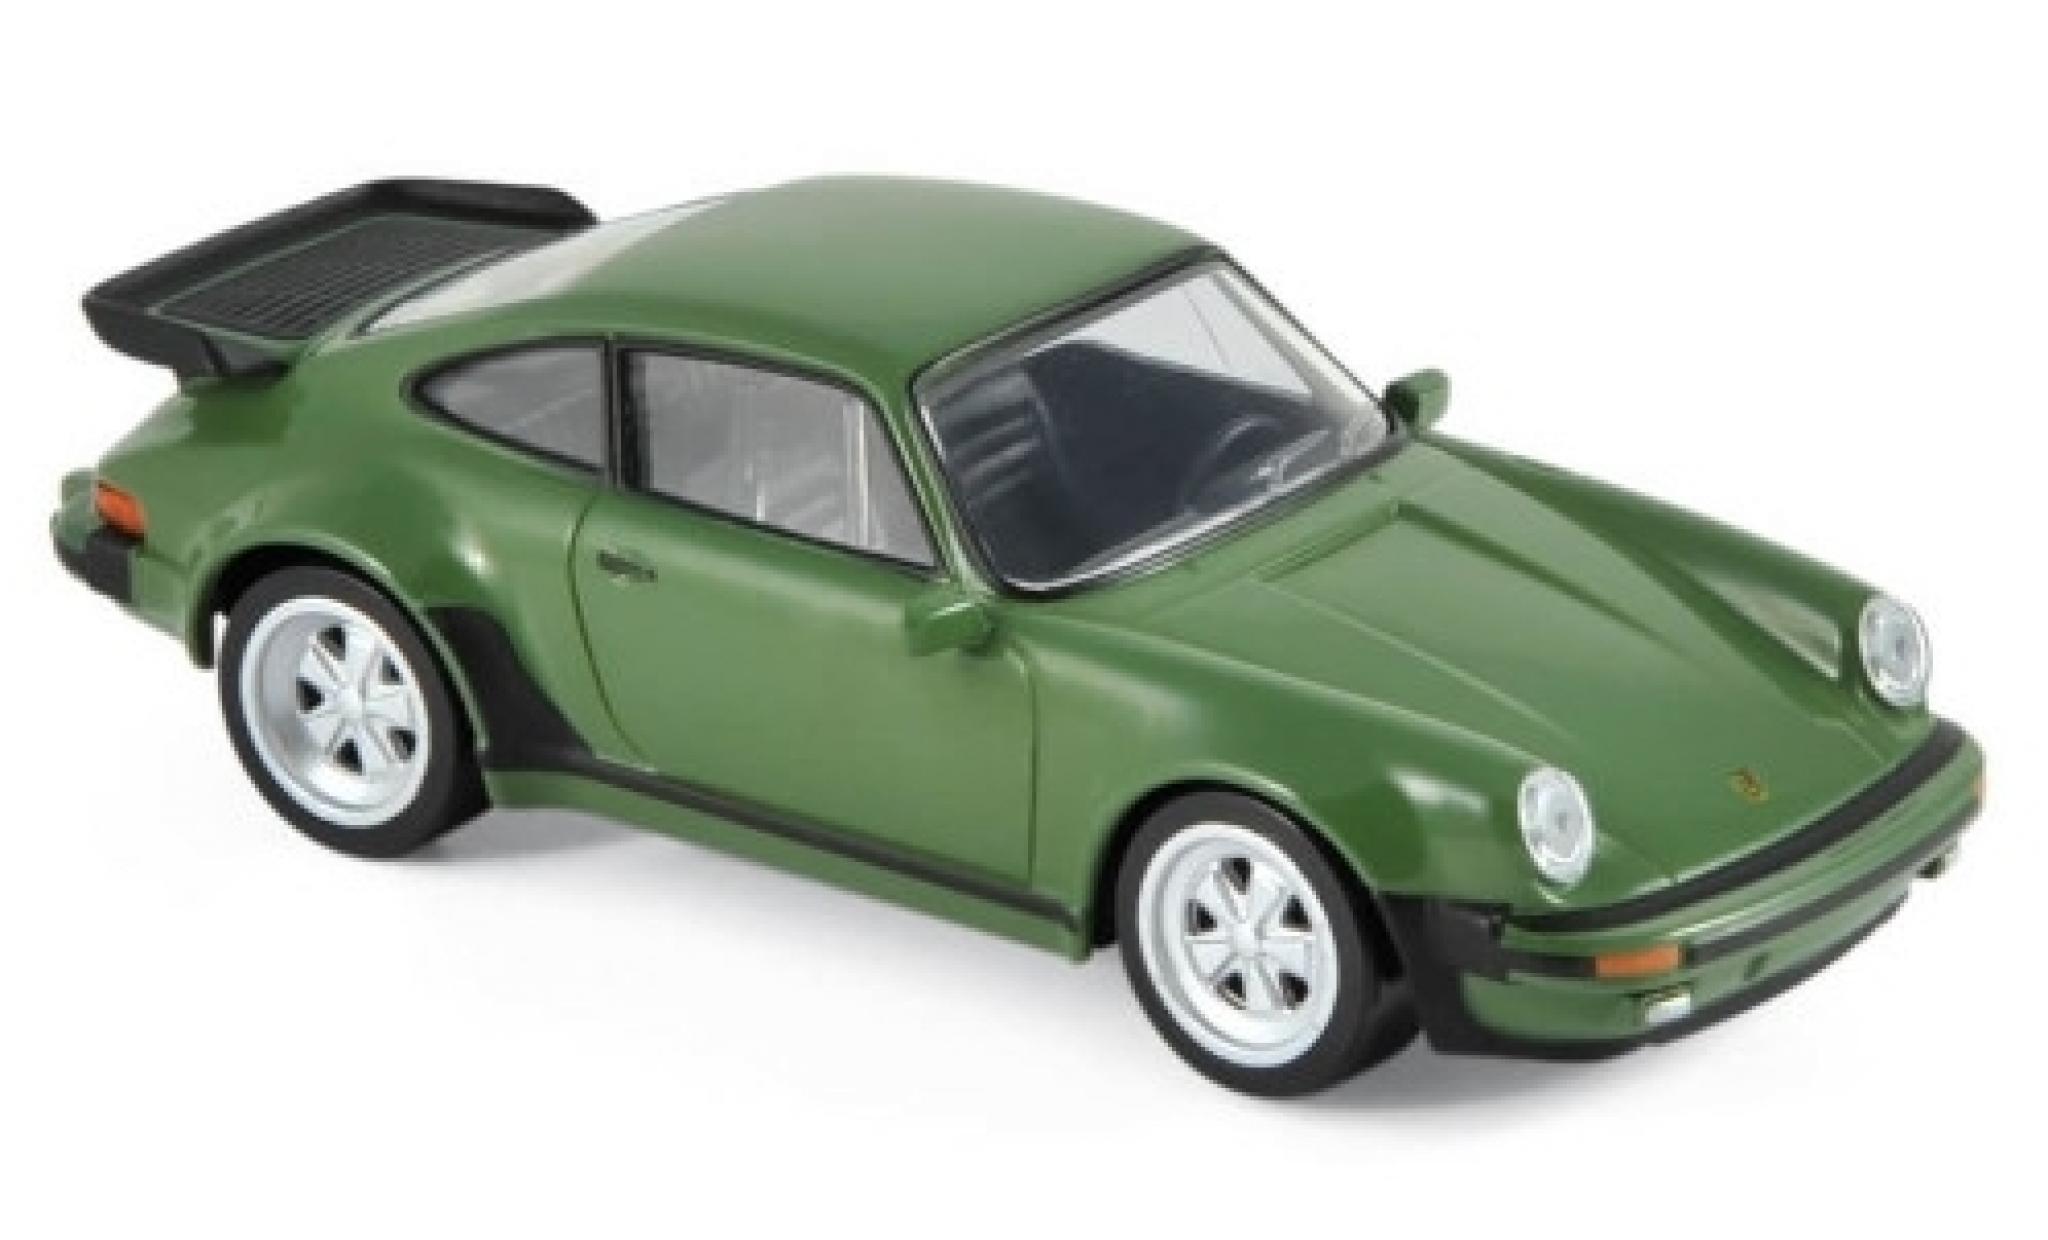 Porsche 930 Turbo 1/43 Norev 911 3.3 green 1978 Jetcar